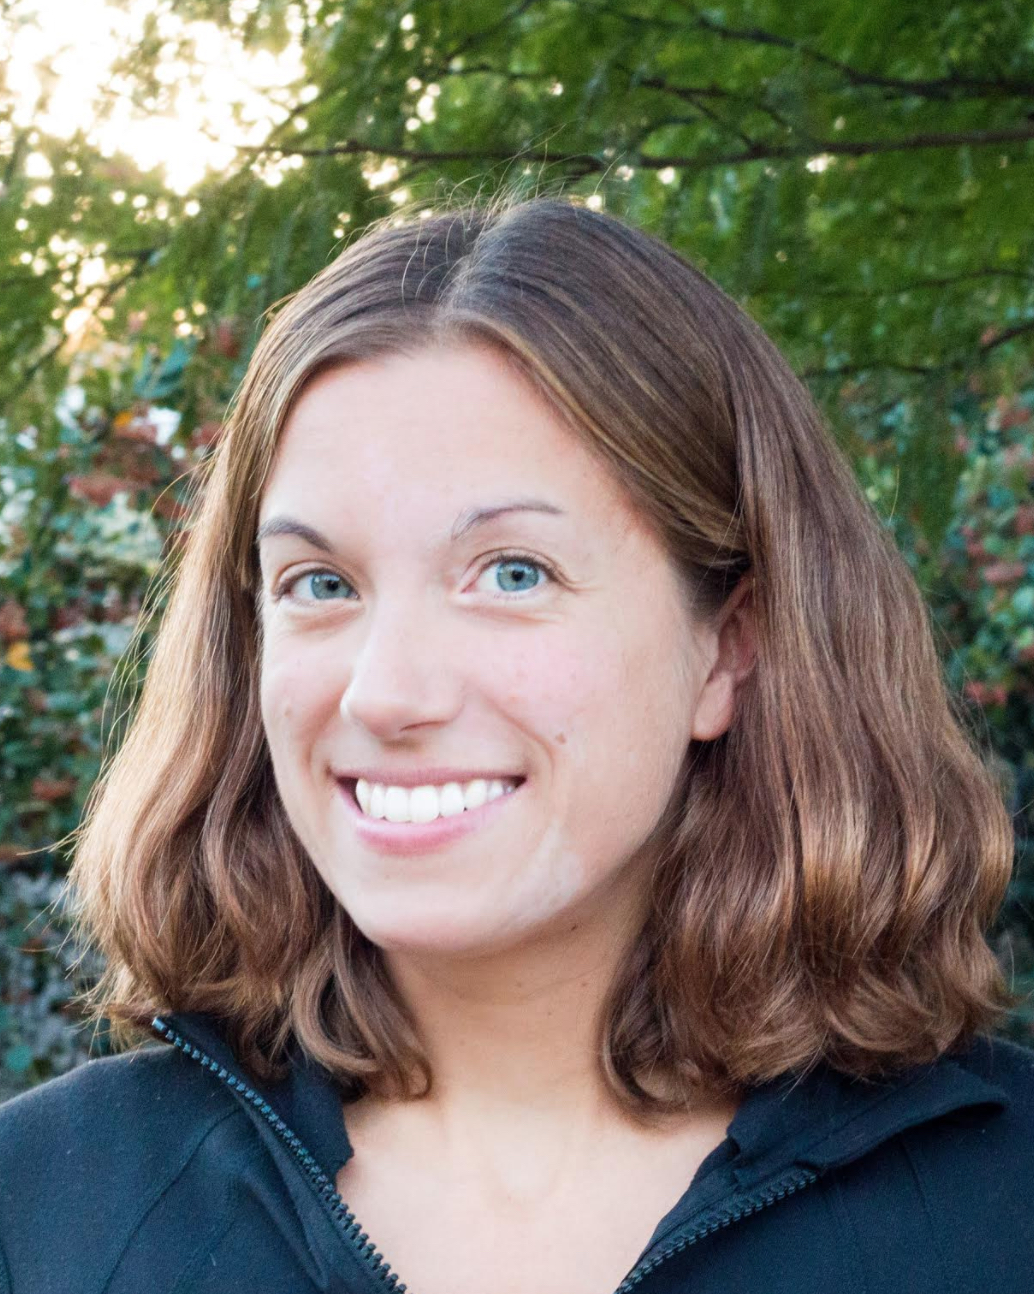 Annika Linke, Ph.D.